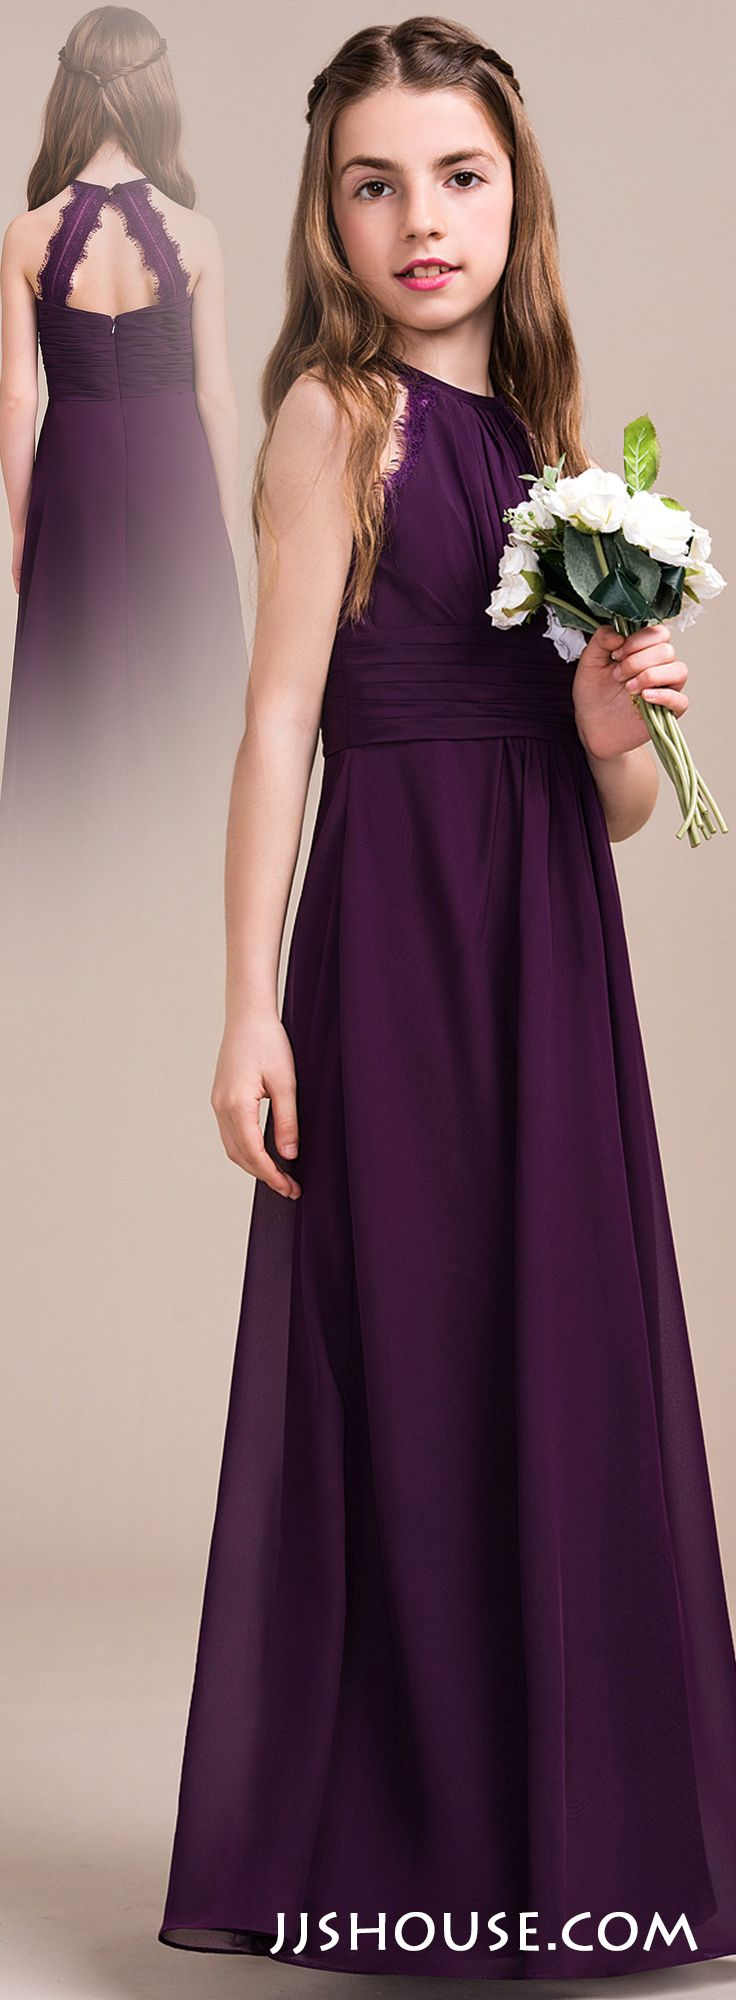 The 25+ best Junior bride dresses ideas on Pinterest ...